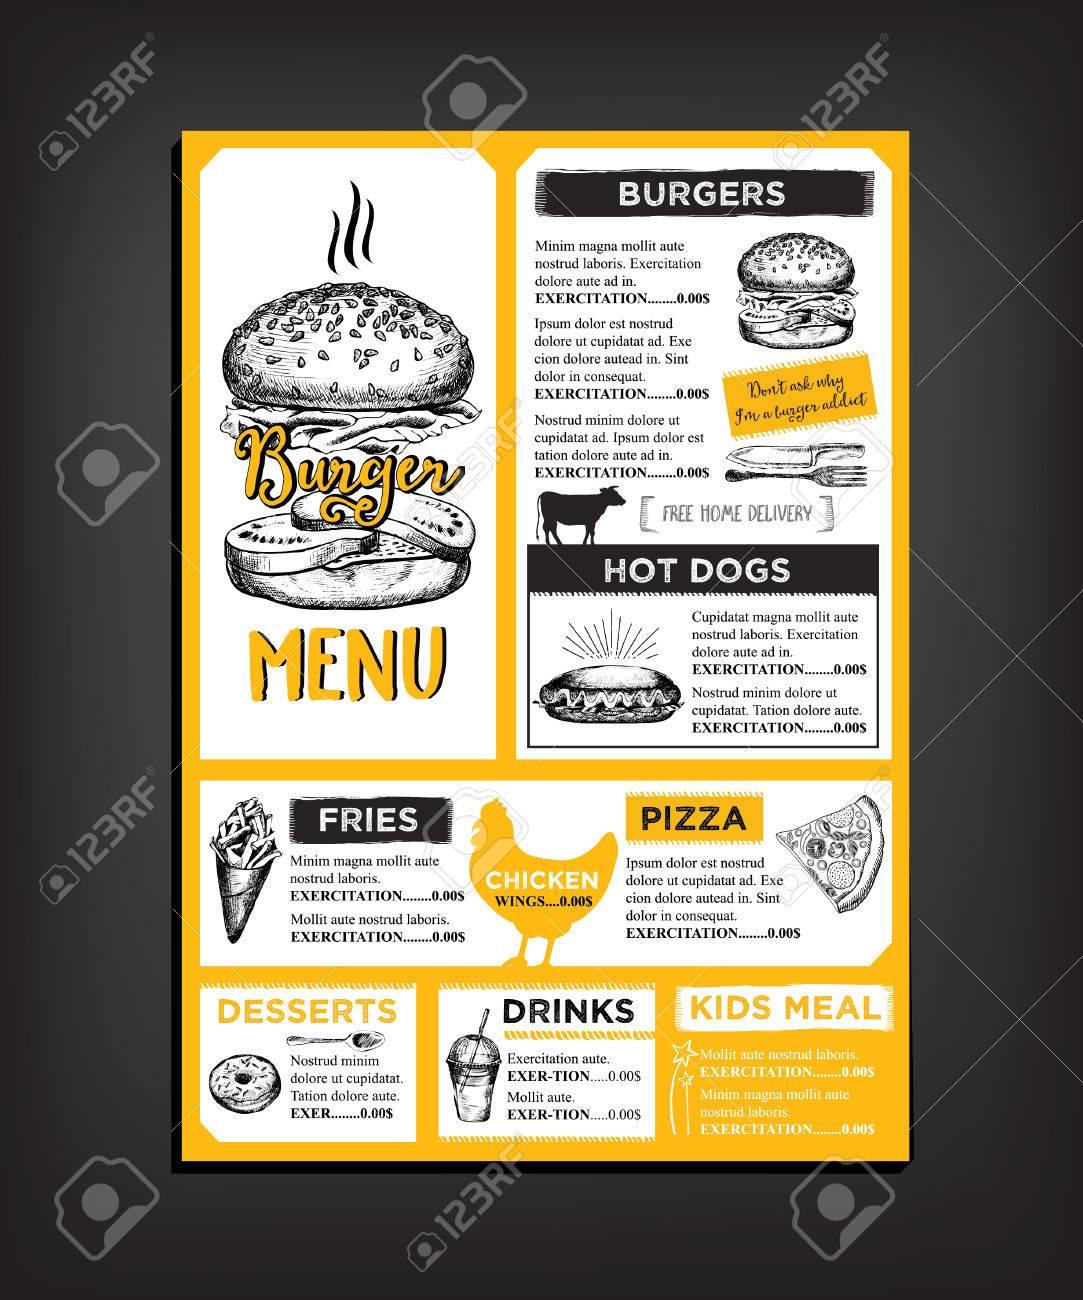 Restaurant brochure vector, menu design. - 50772151